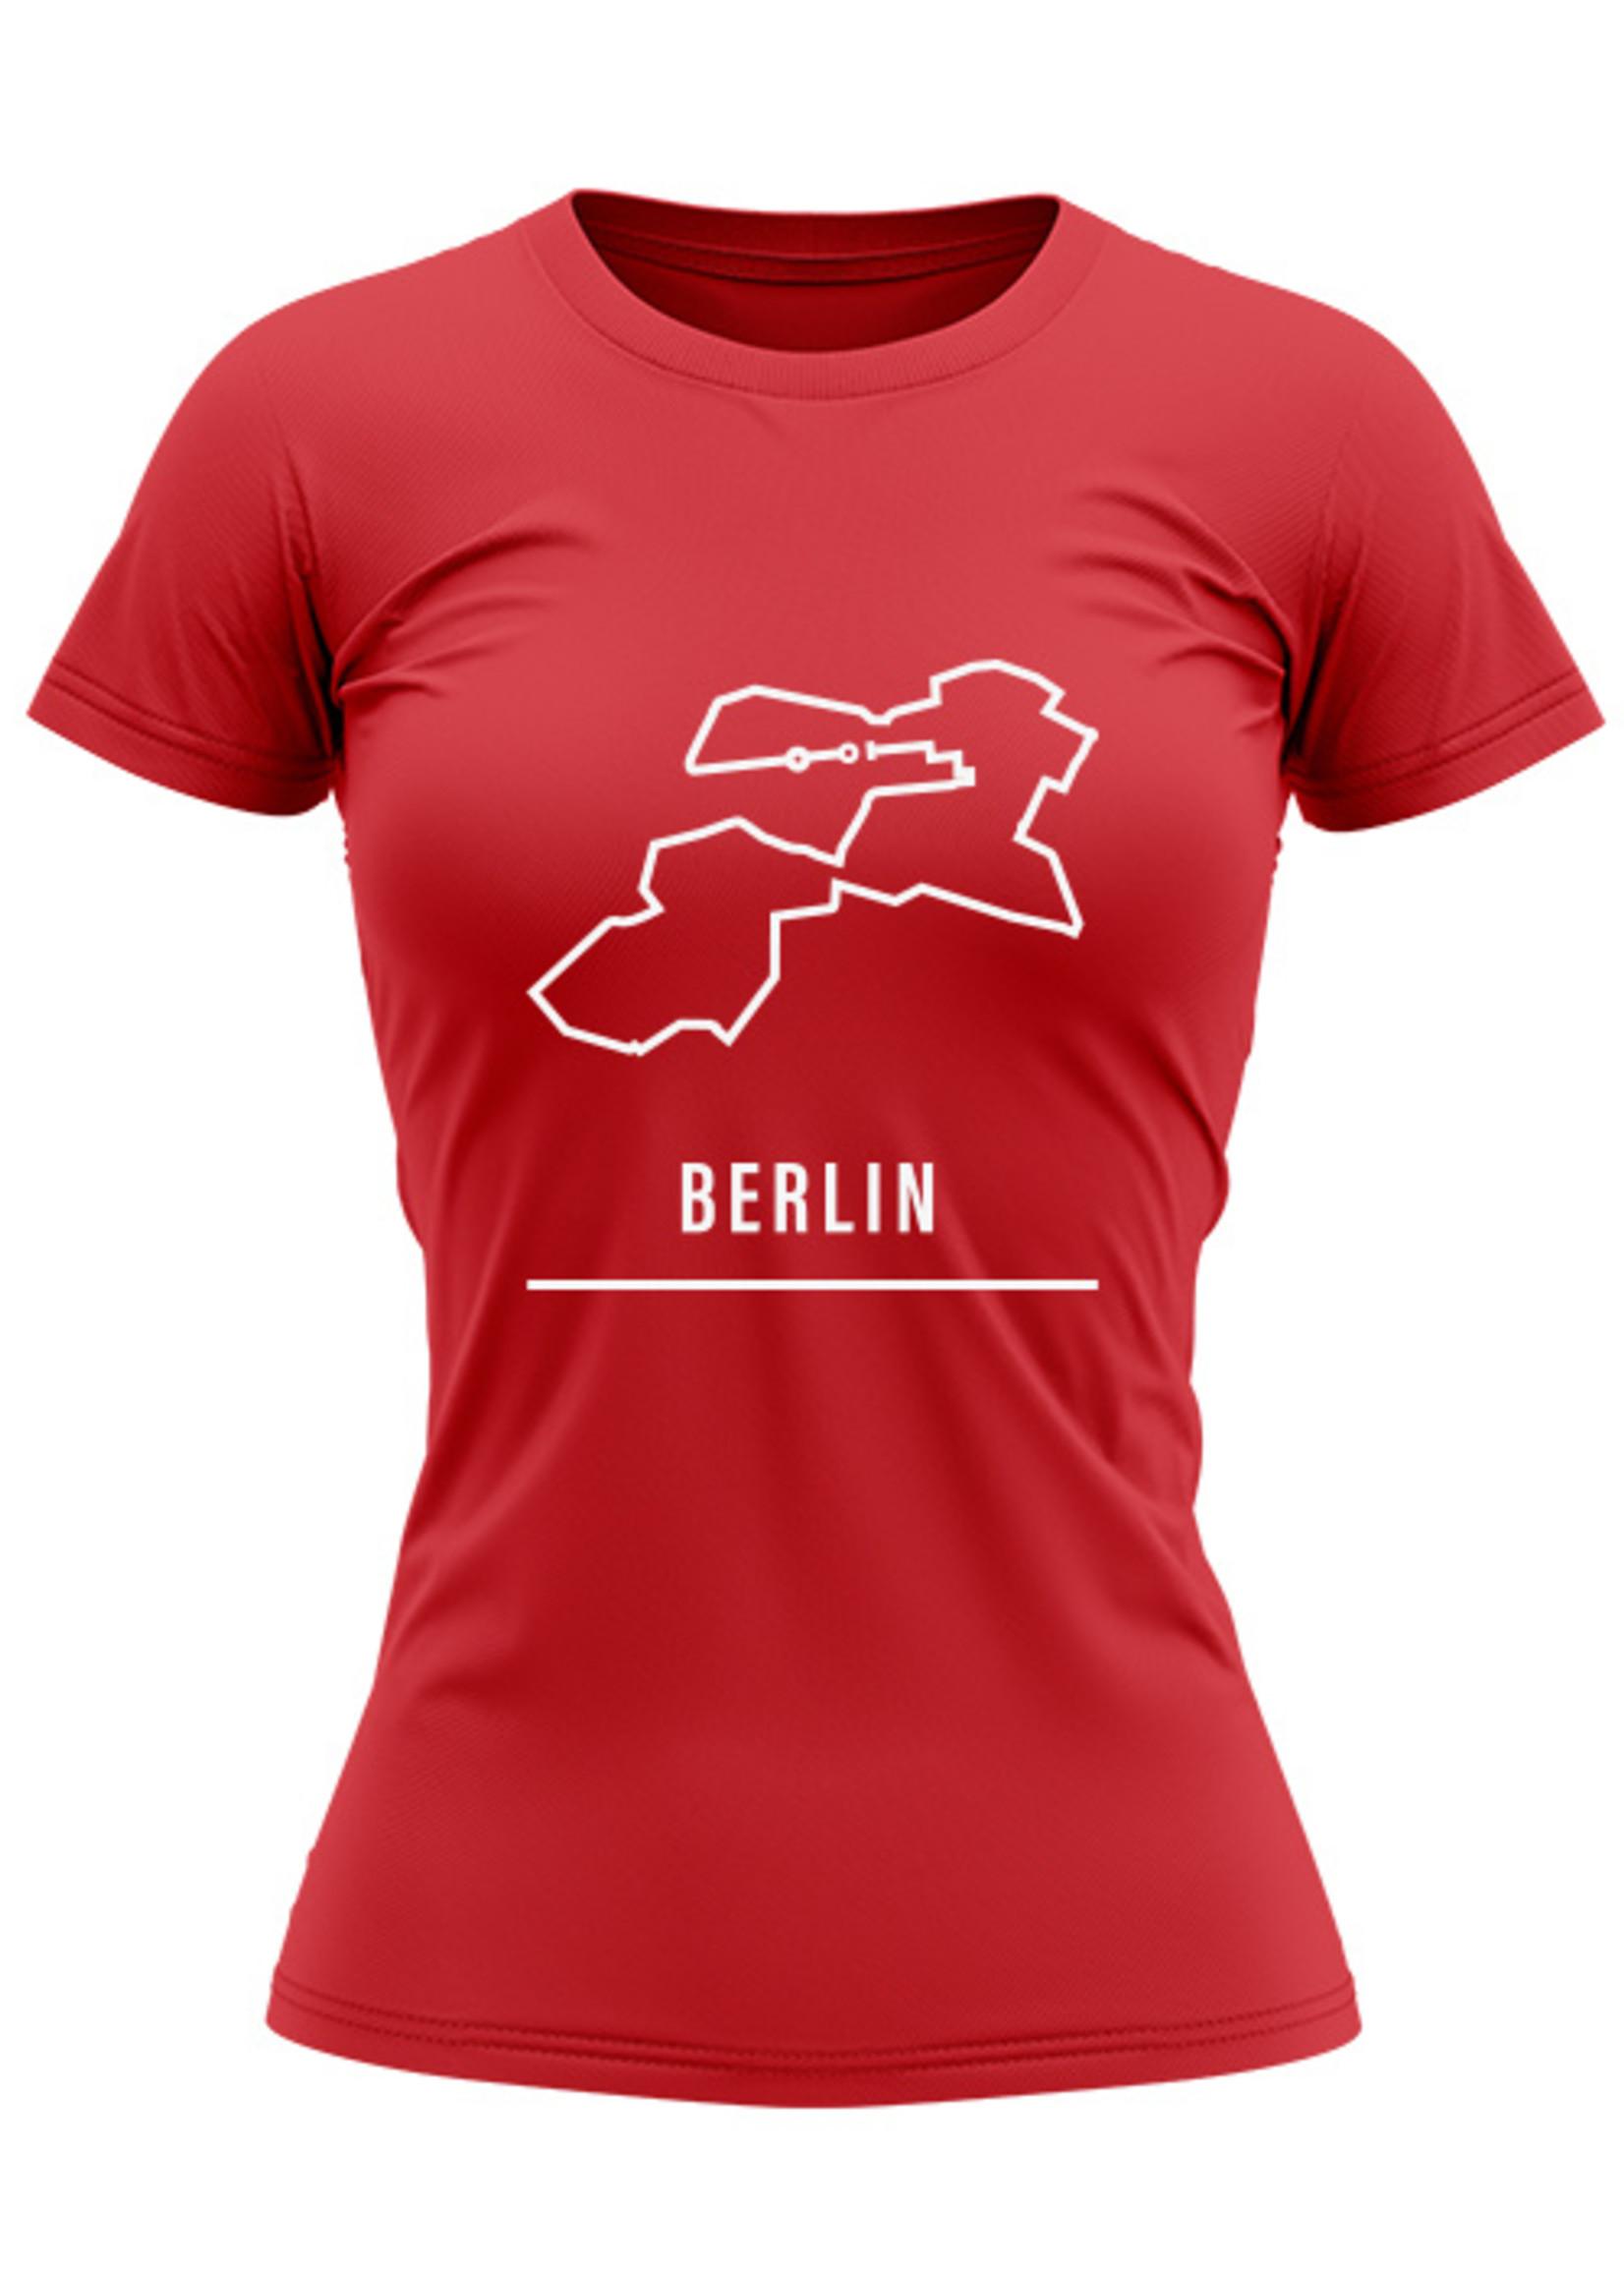 Rebel & Dutch Woman sportshirt Berlin marathon